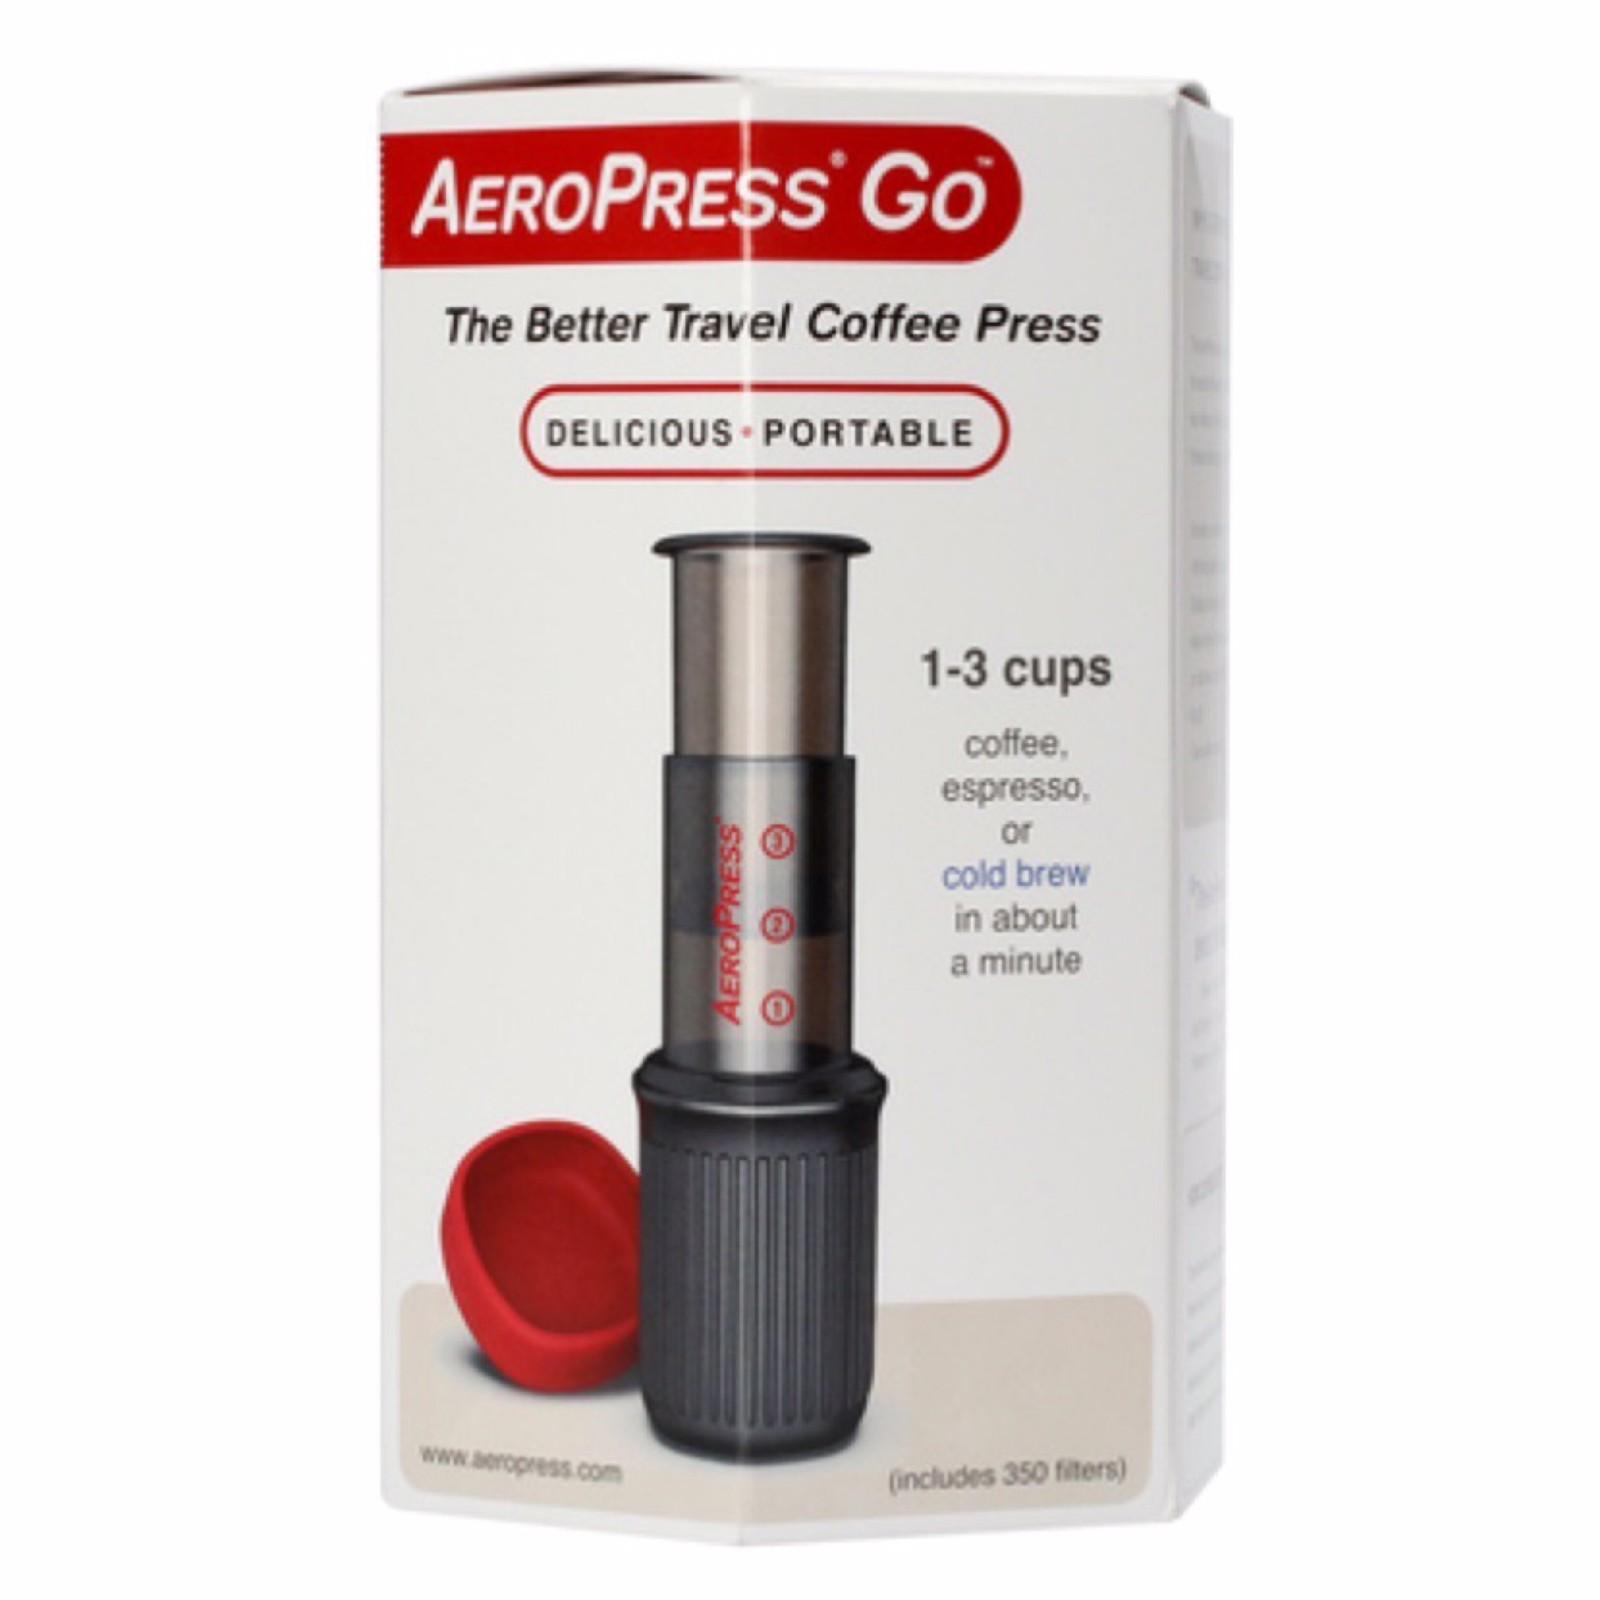 AeroPress Go Coffee Maker + 350 filters